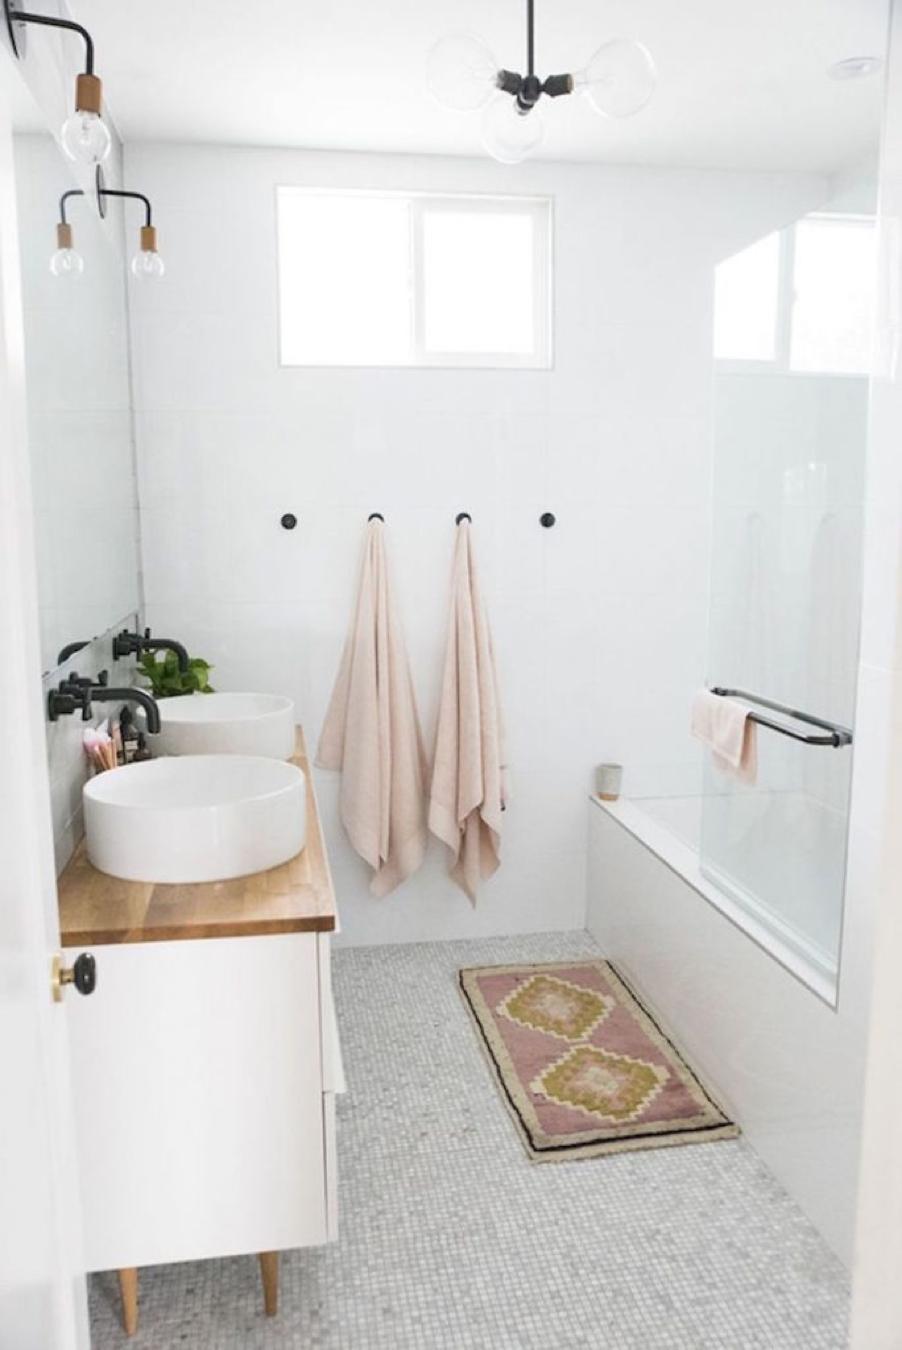 11 Creative Ways To Make A Small Bathroom Look Bigger Designed Small Bathroom Bathroom Design Bathroom Interior